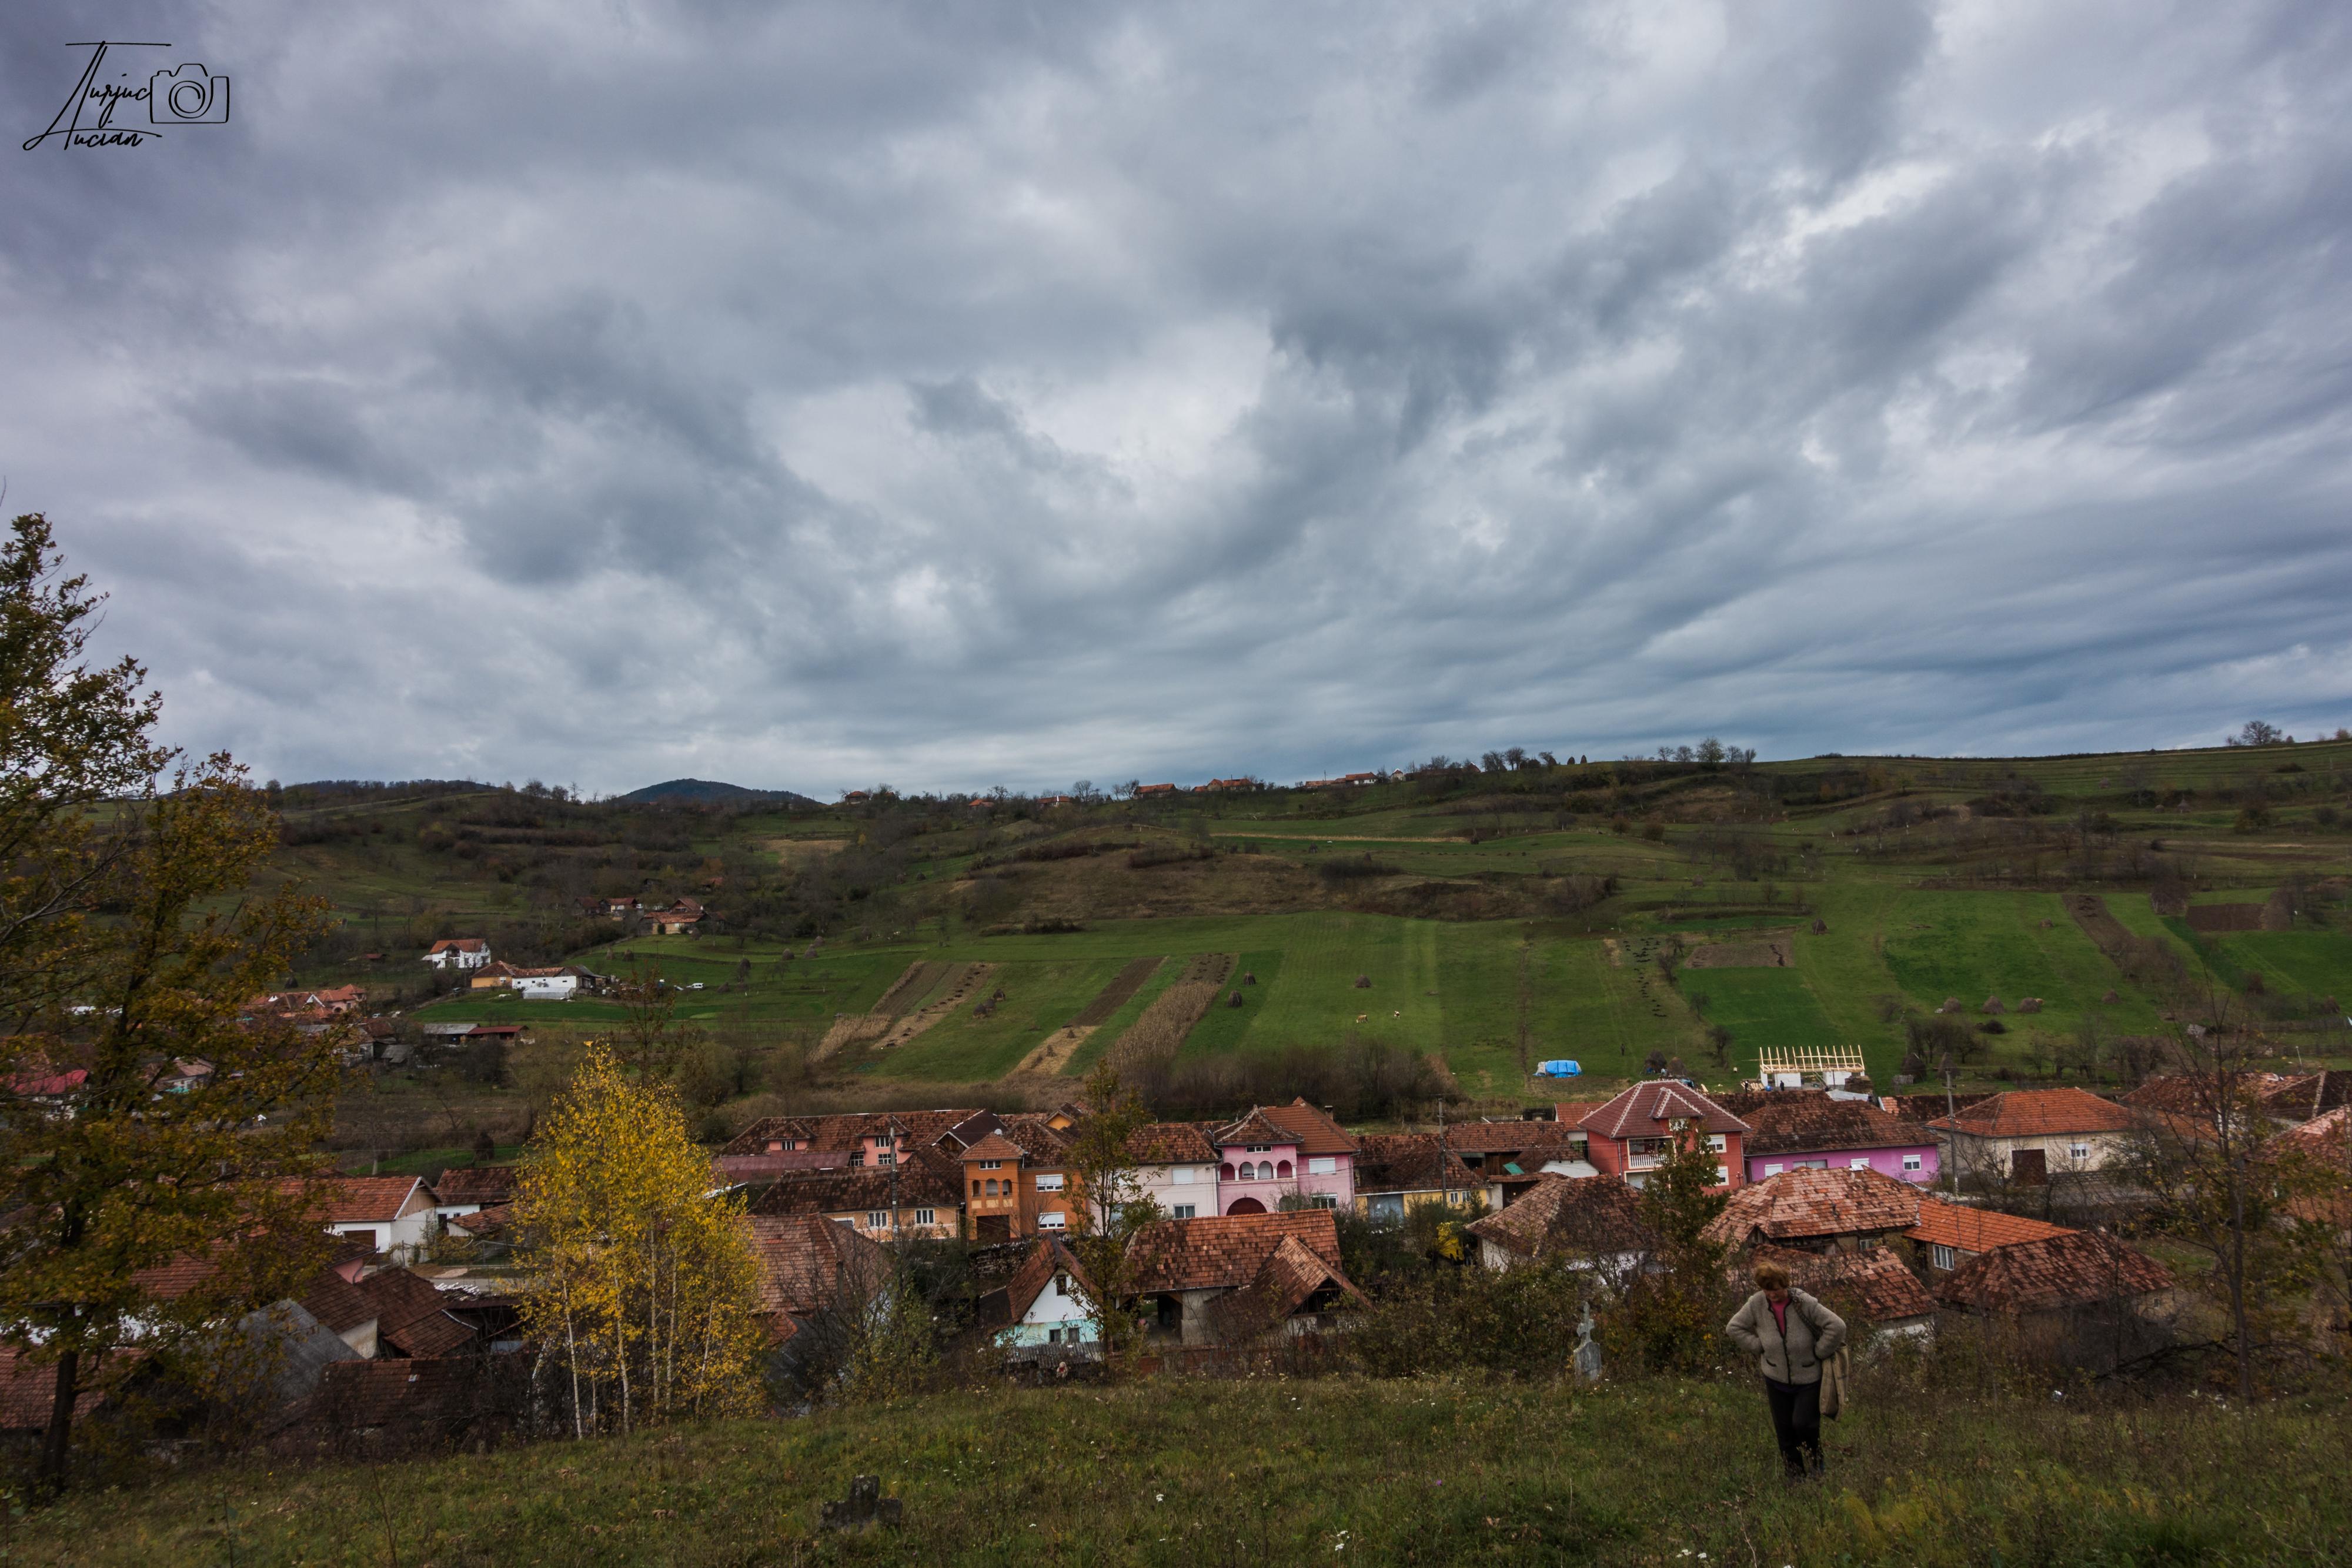 drumul bisericilor Bihor (35)